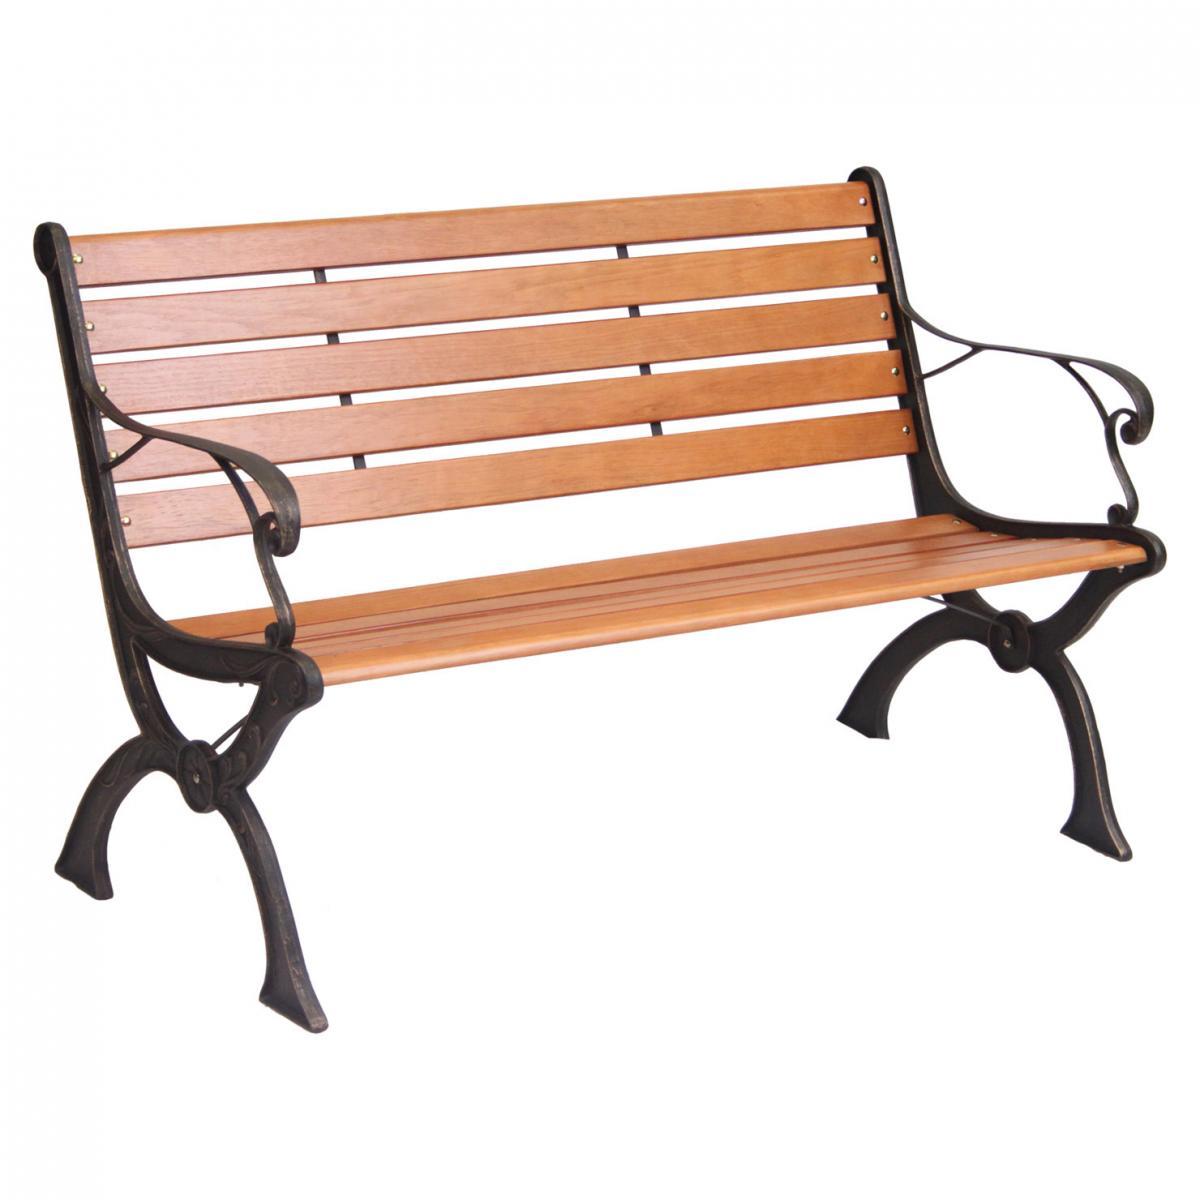 10 Slat Hardwood Park Bench – Now Only £75.00